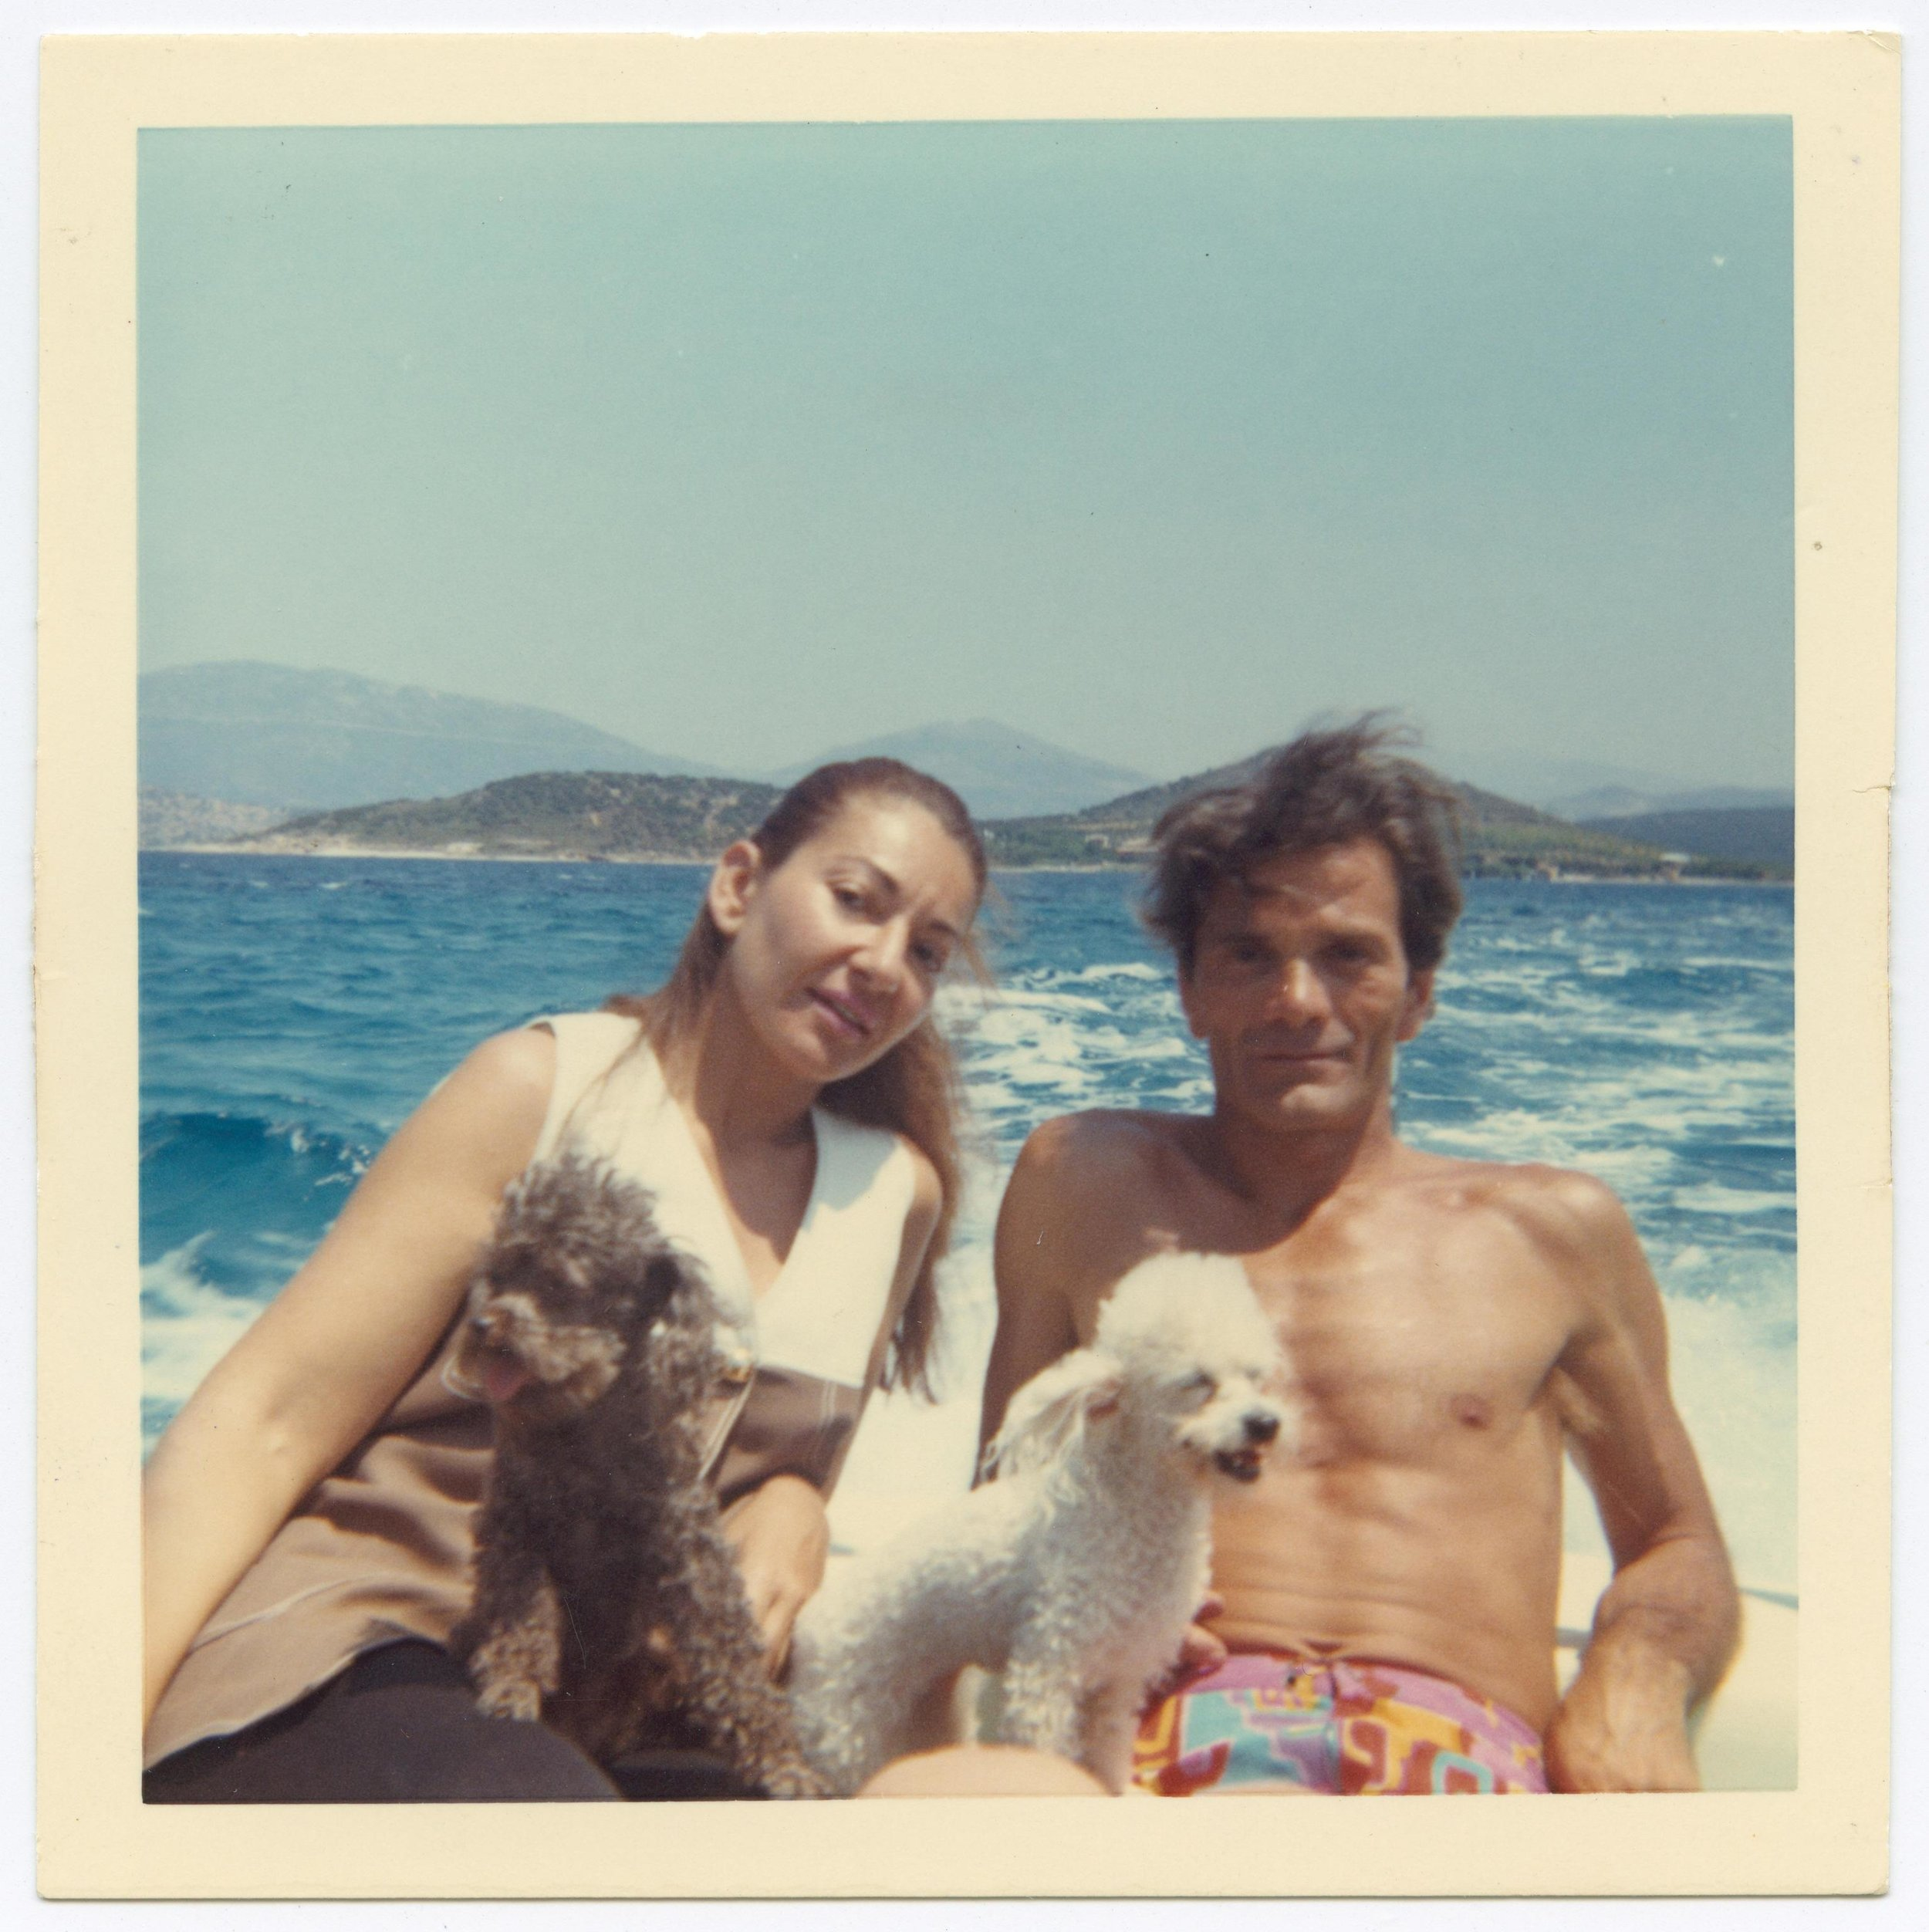 avec Pasolini en vacances en Grece 1970 Copyright Fonds de Dotation Maria Callas.jpg